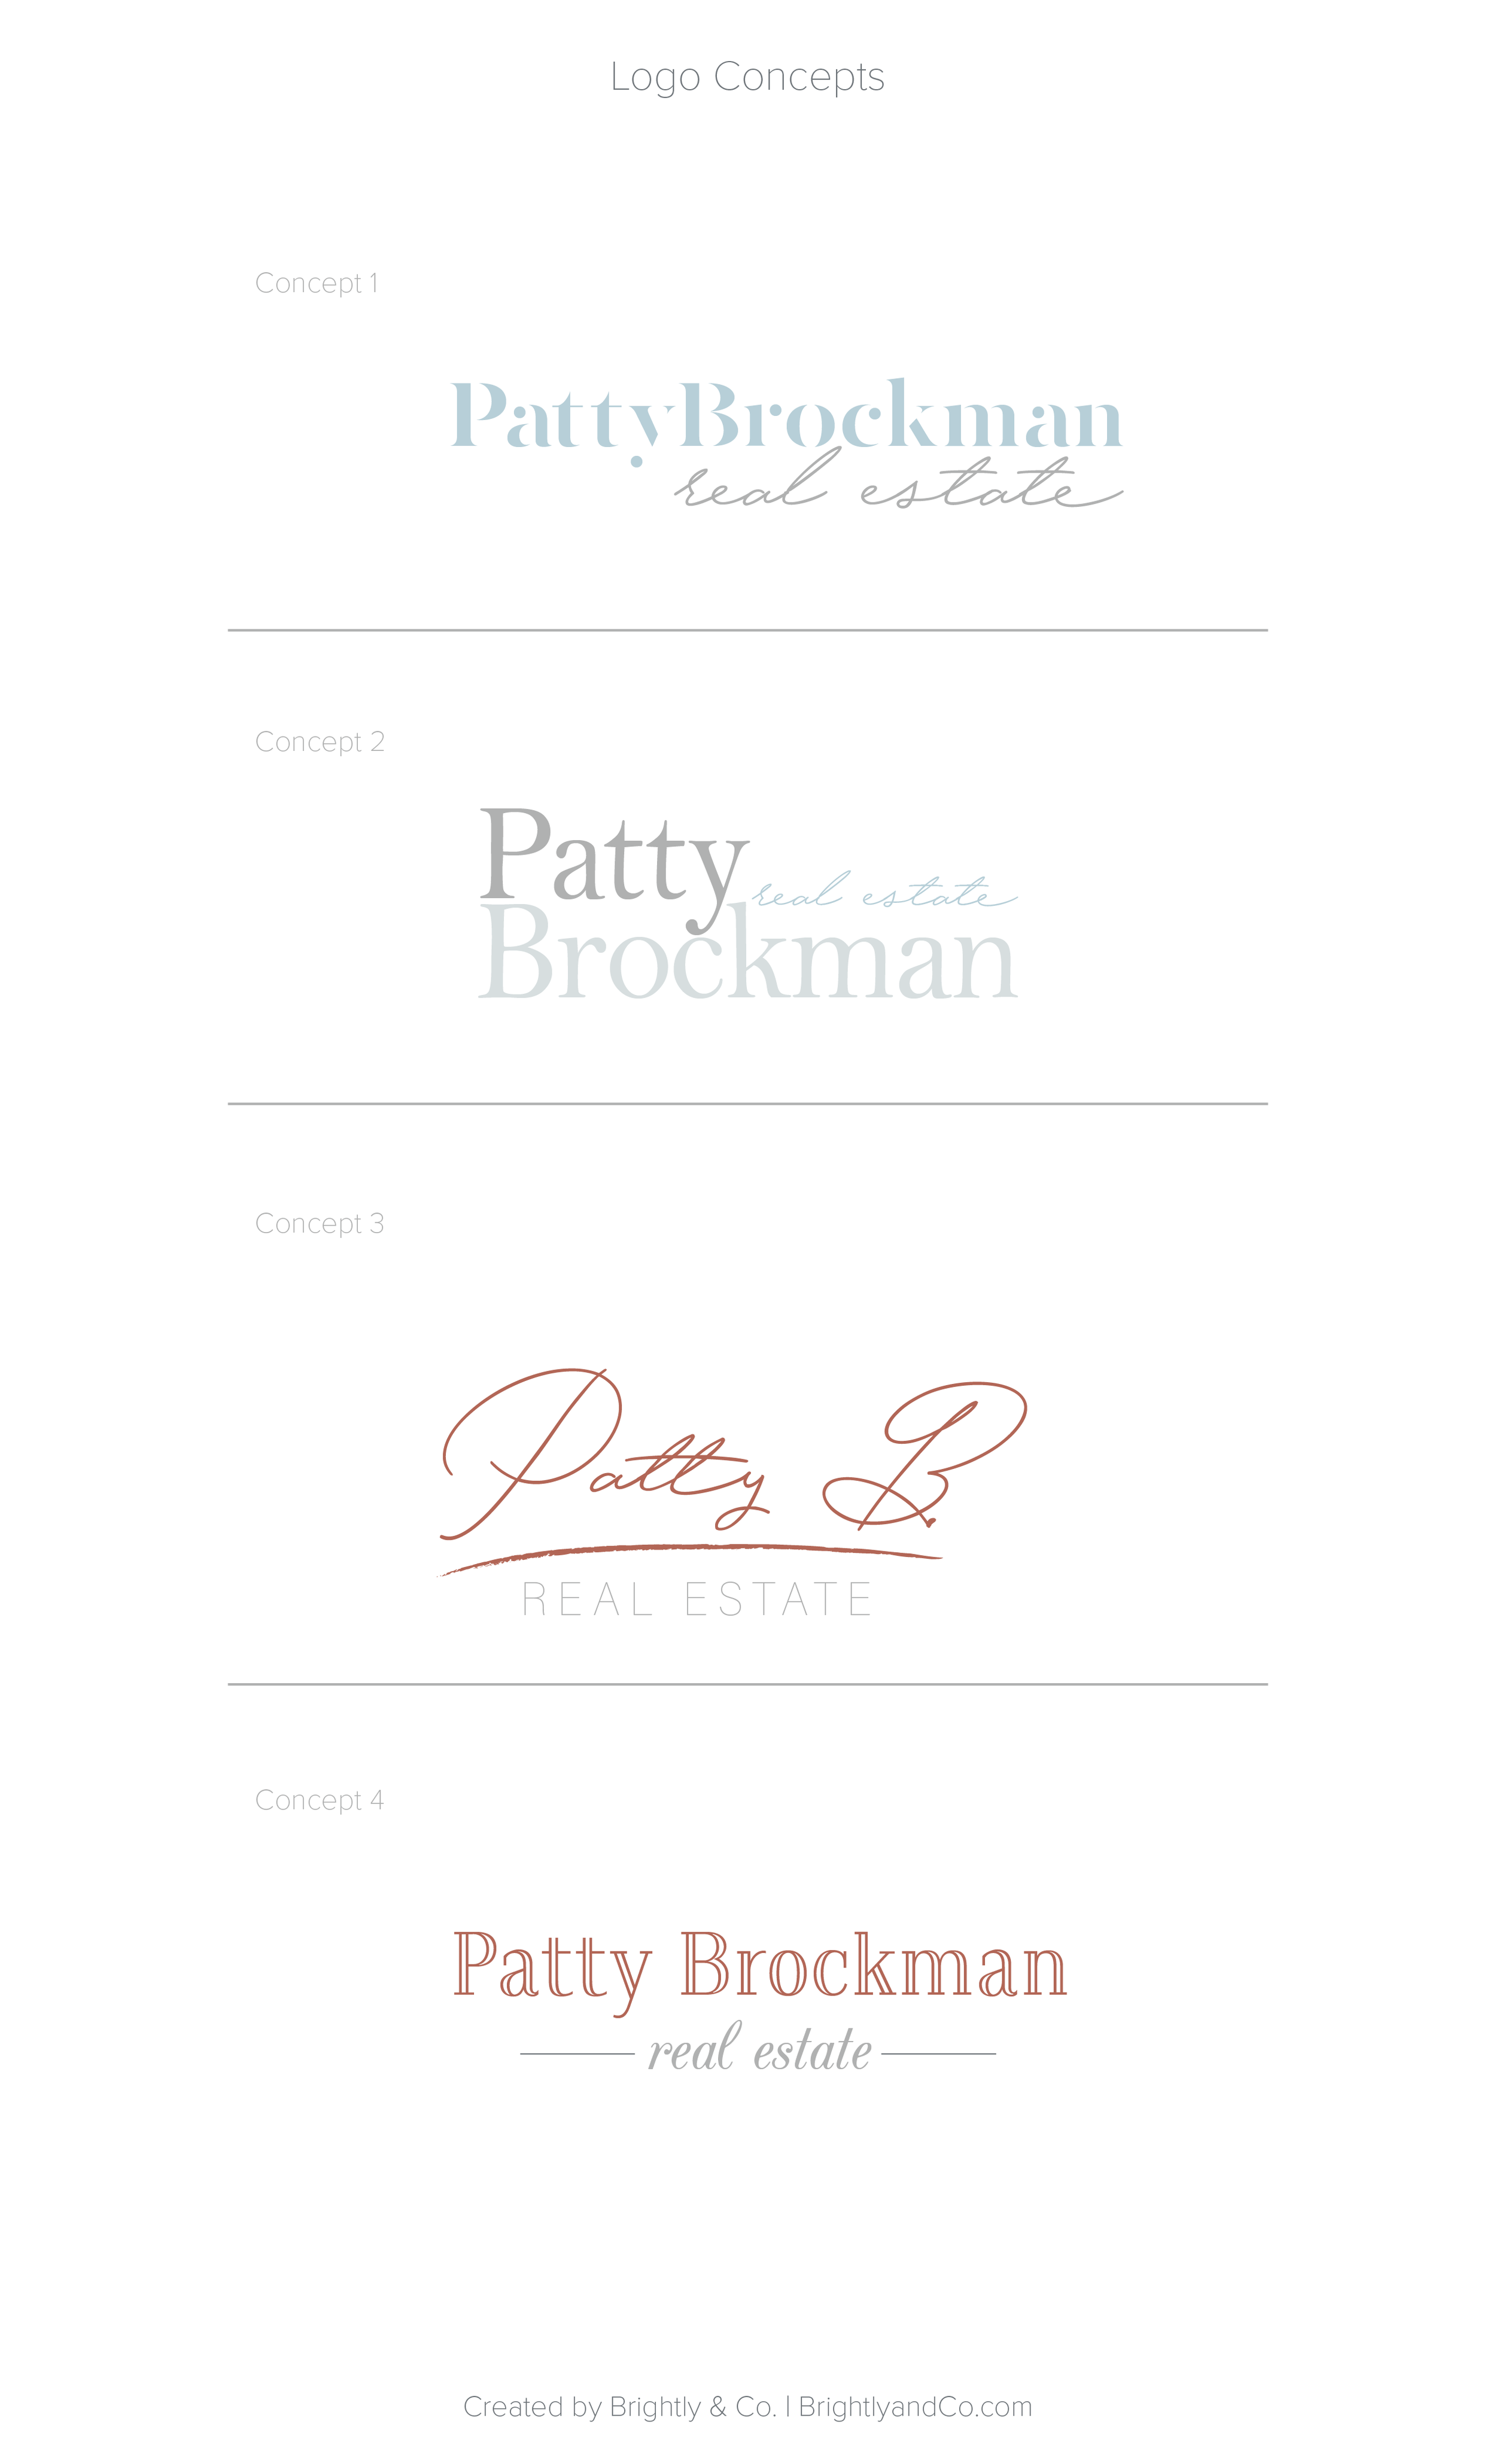 Patty Brockman Real Estate Brand Design (Logo Concepts) by Brightly & Co. | www.BrightlyandCo.com